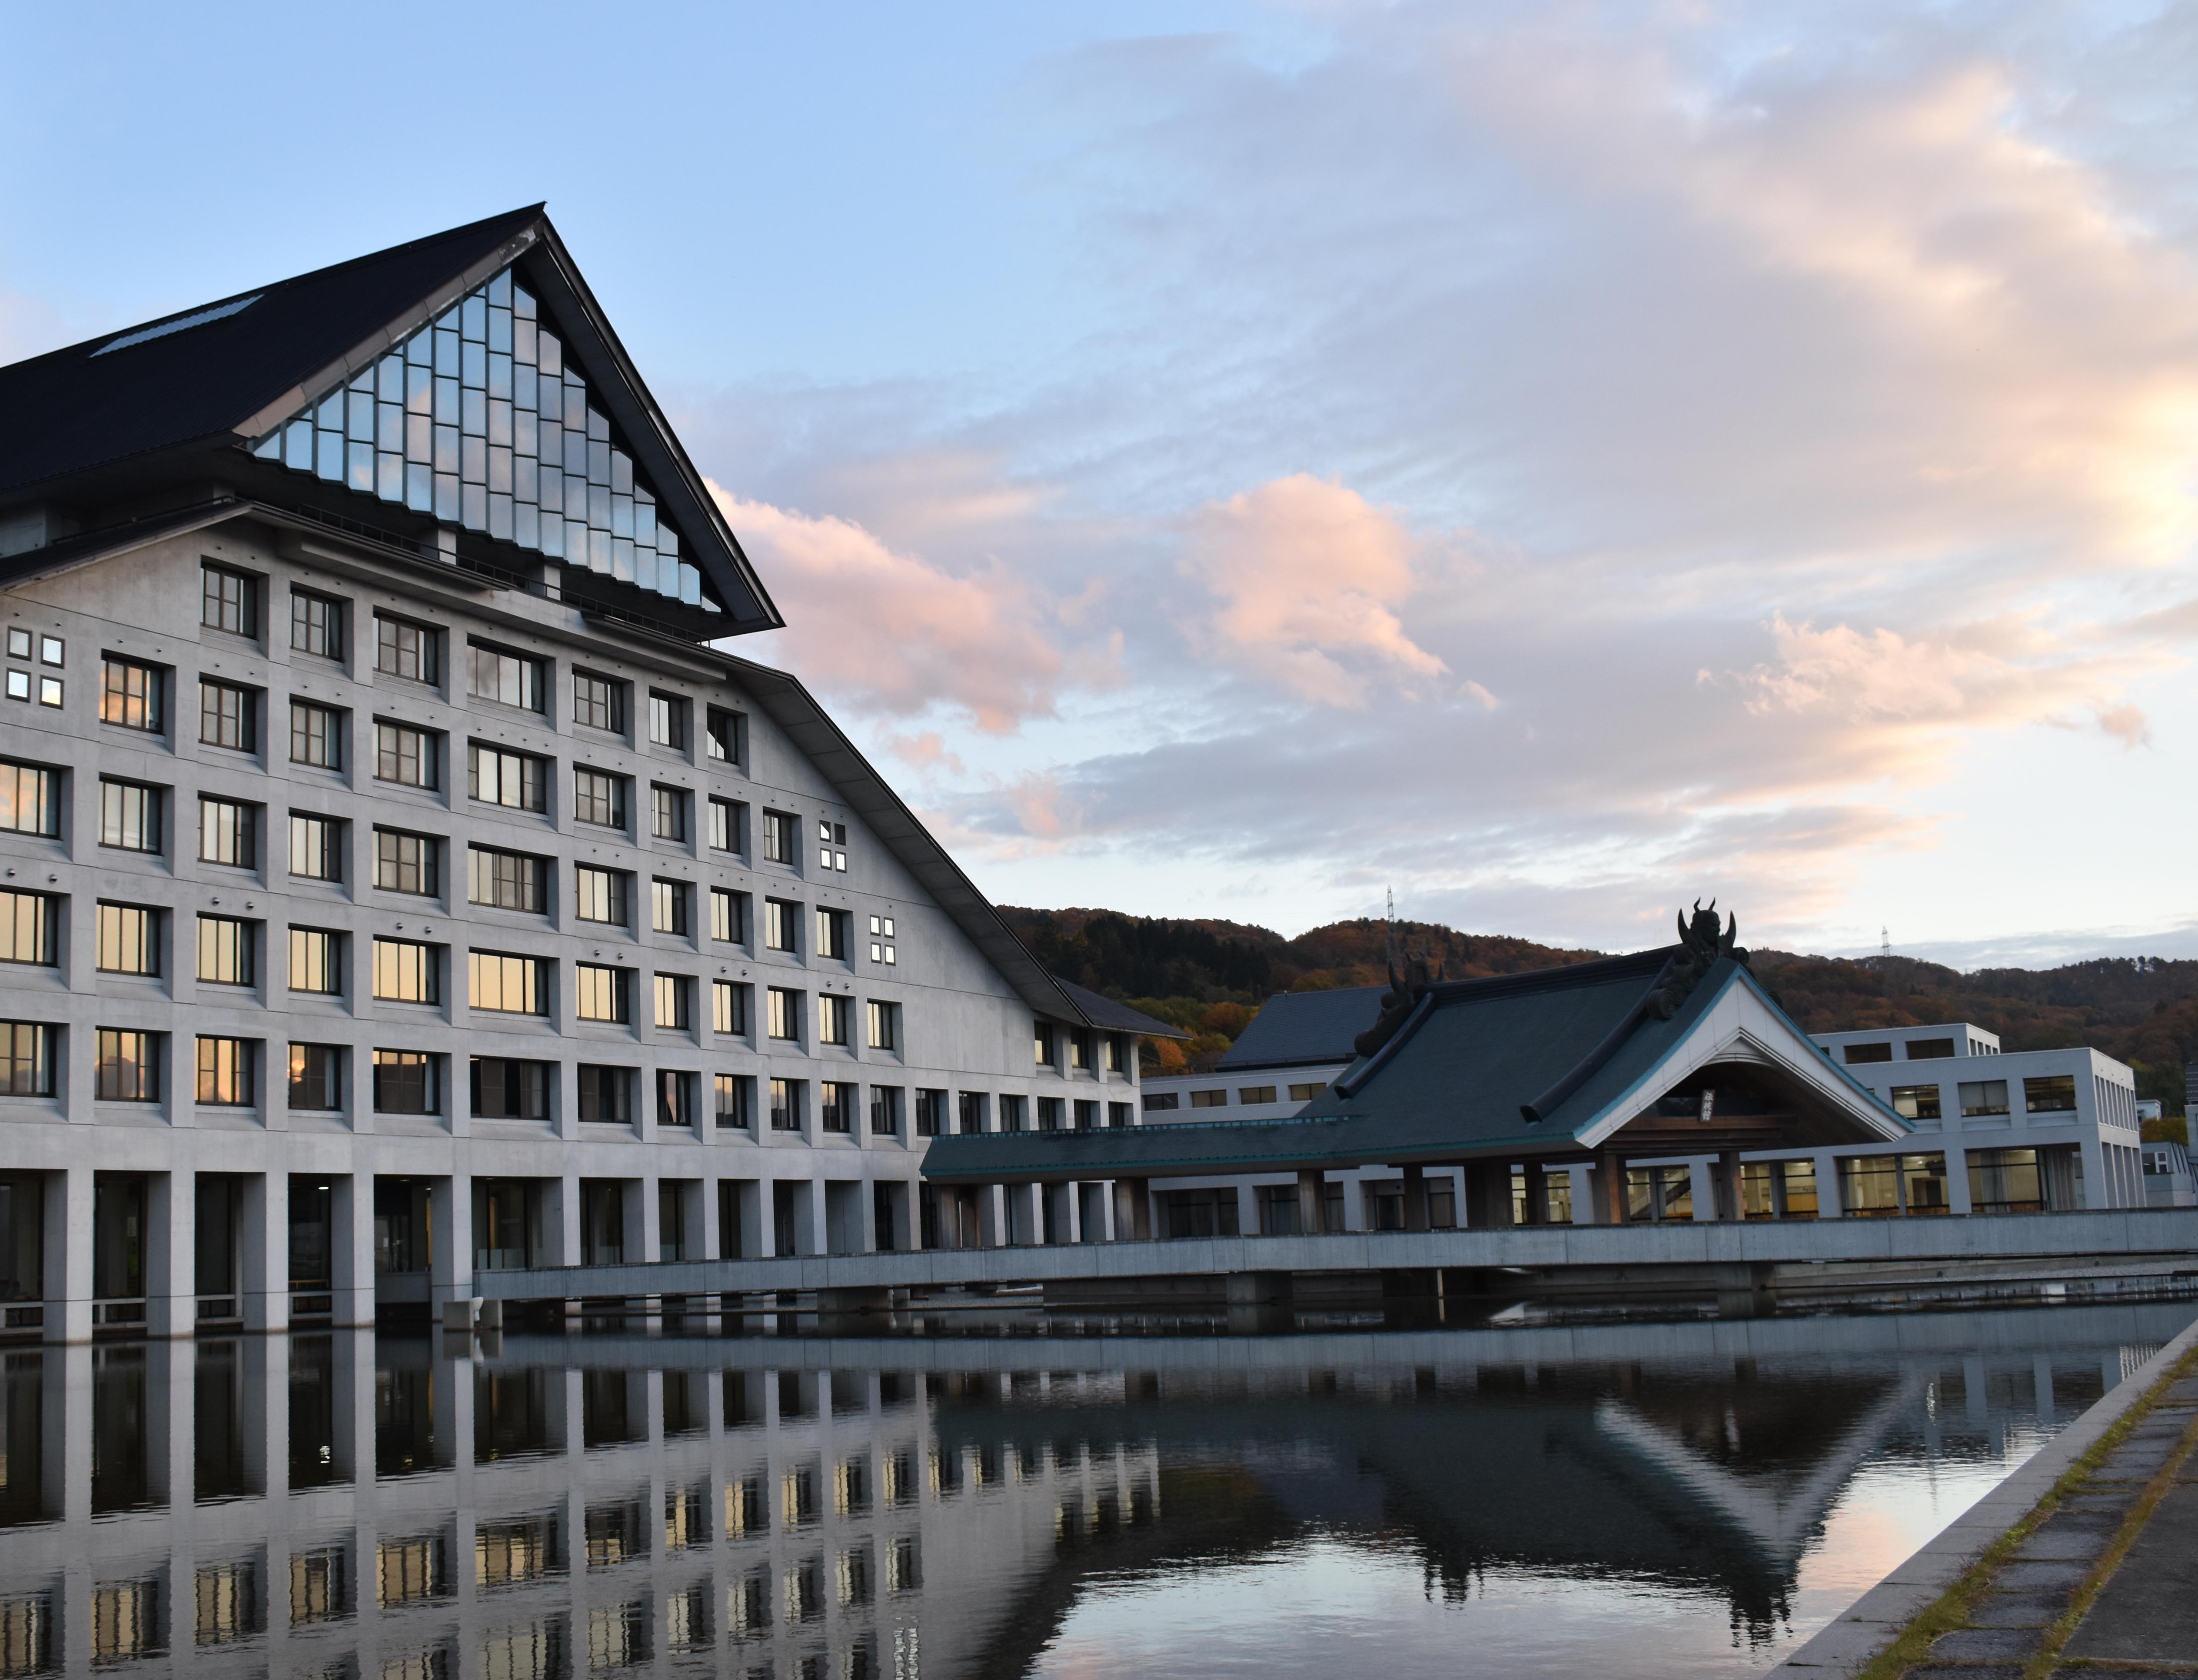 Free Images : yamagata, japan, university, water, mirror